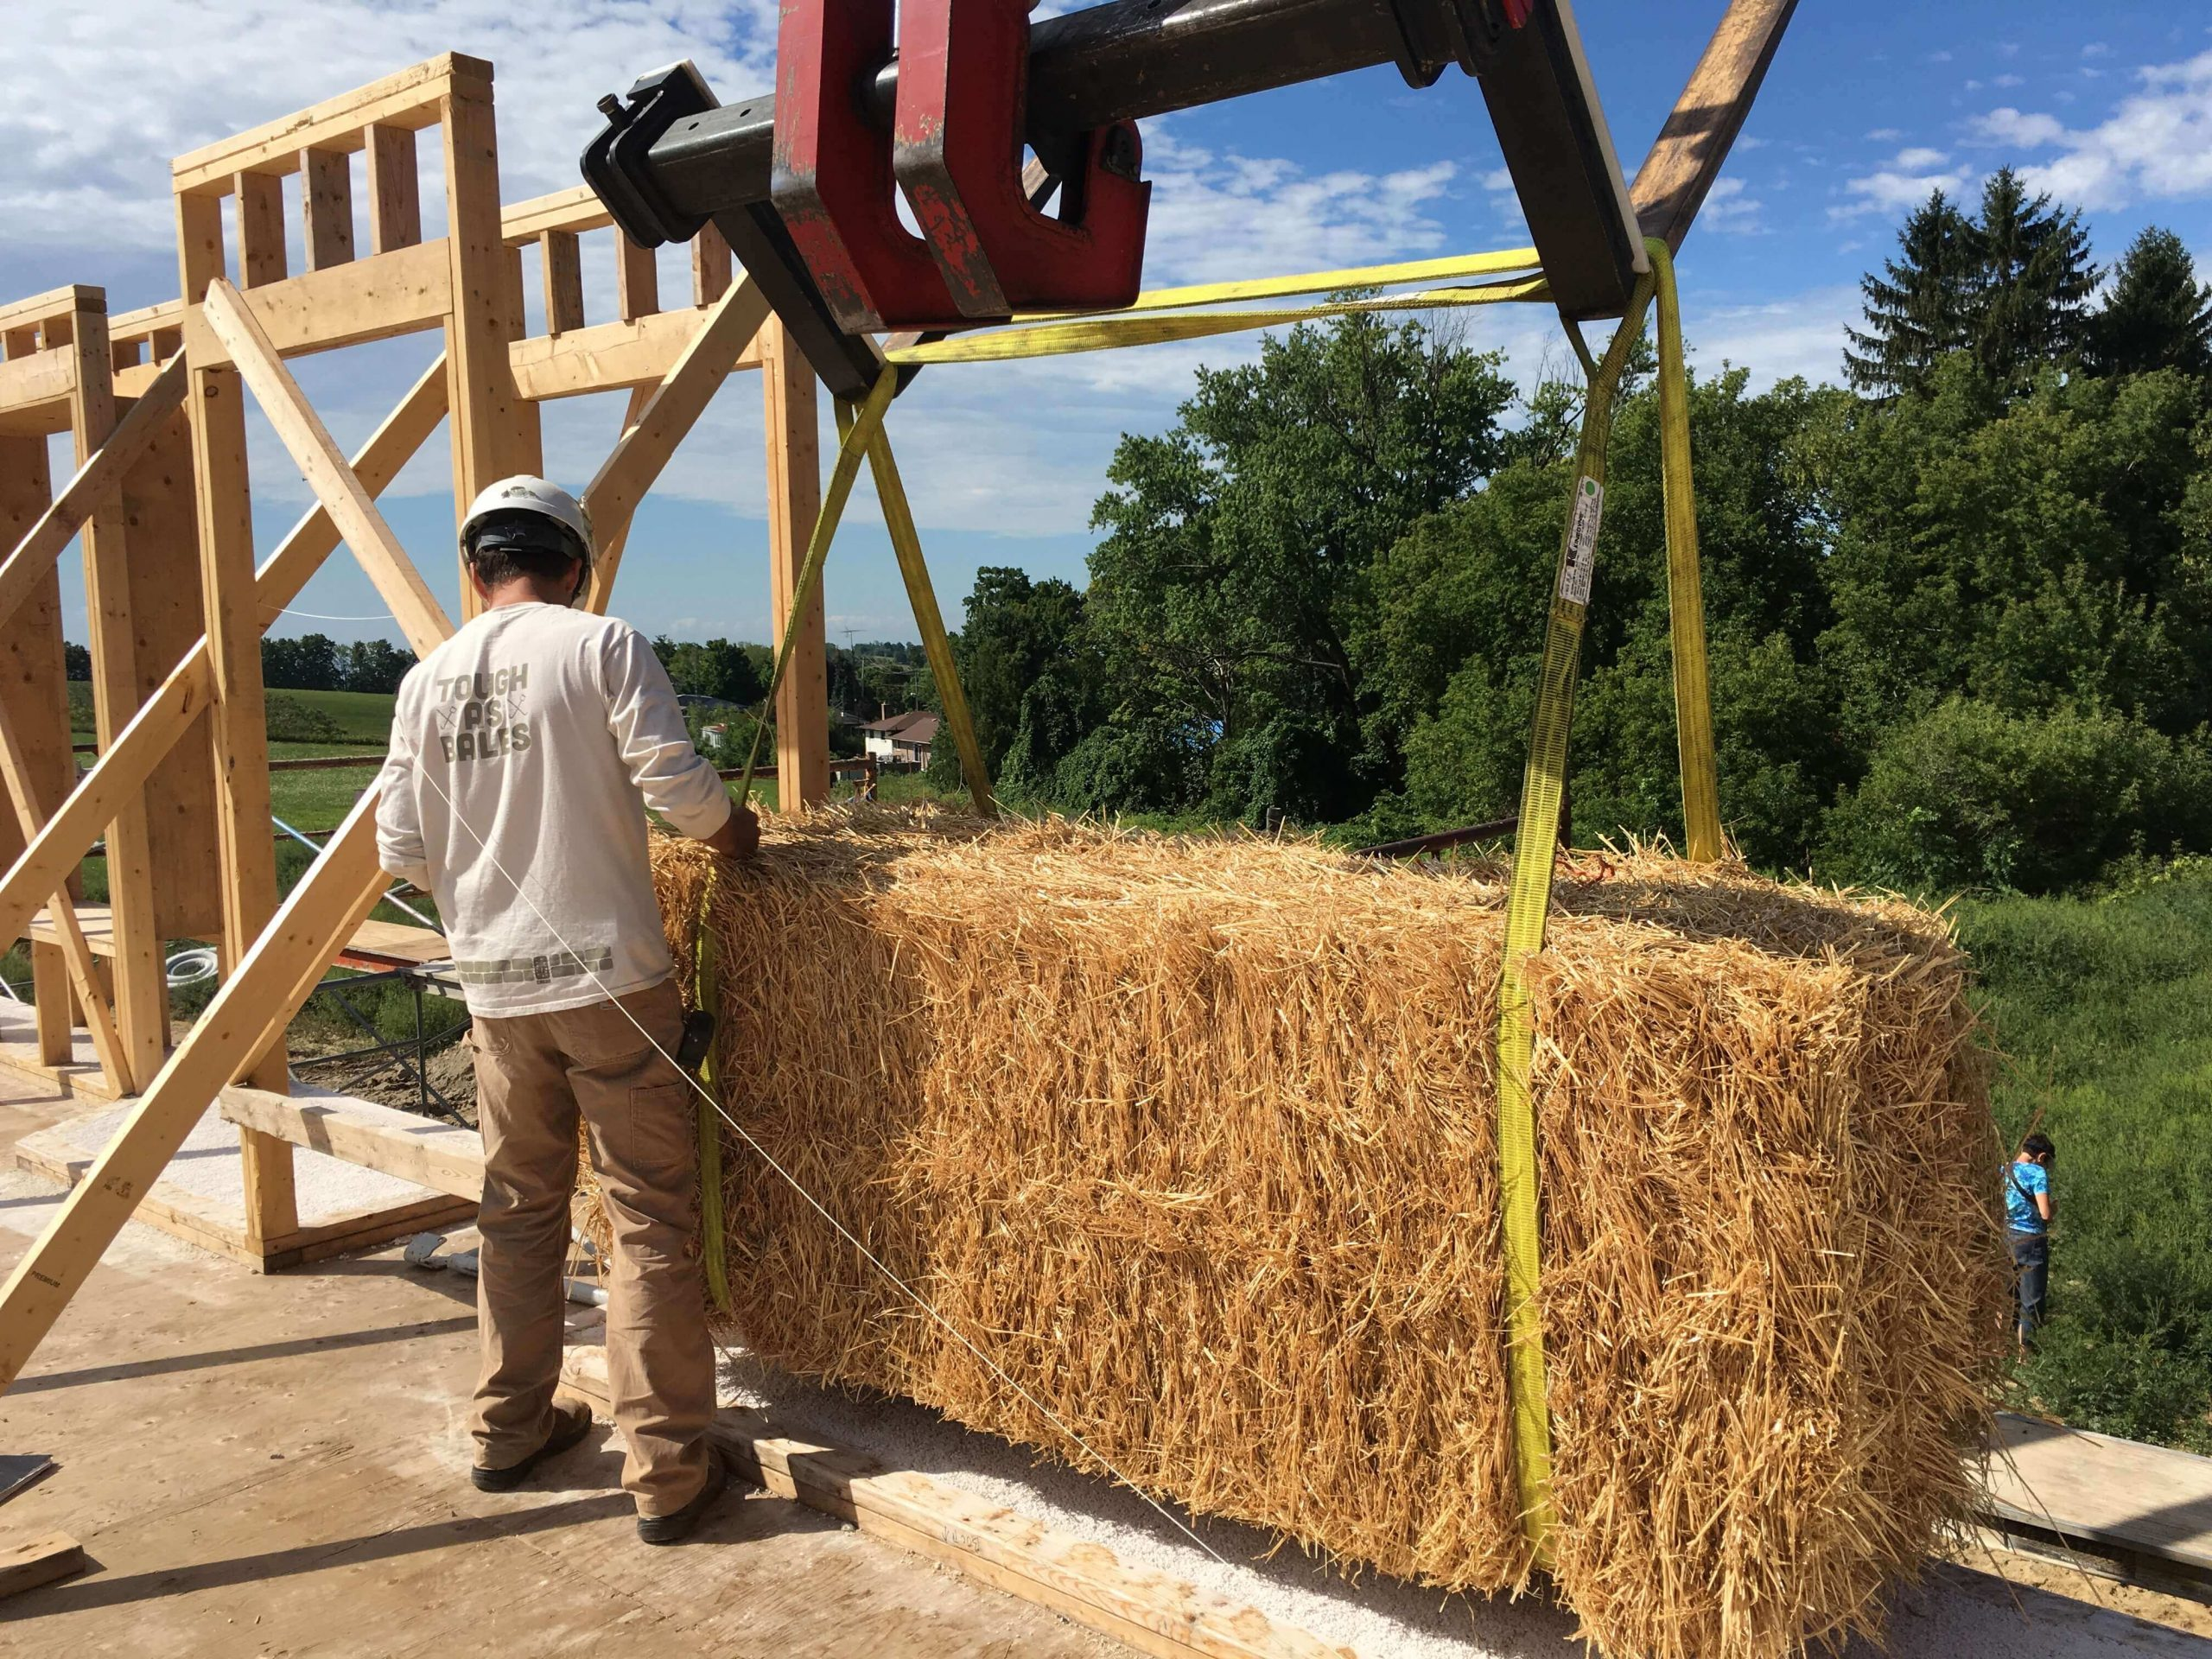 Building a jumbo straw bale wall